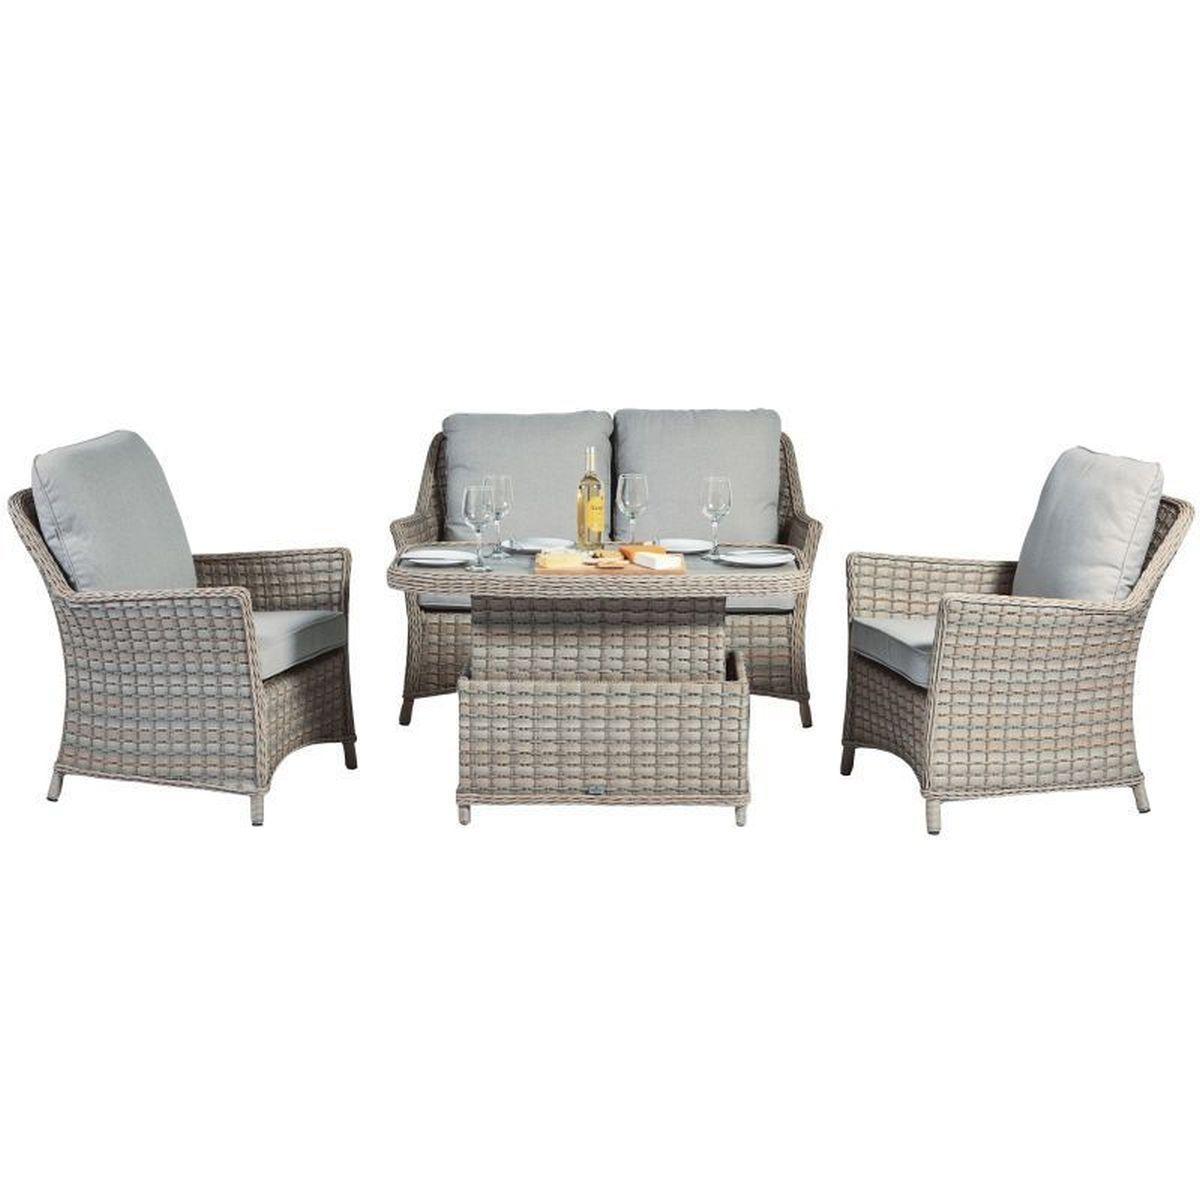 Supremo Venice Lounge Set Garden, Venice Outdoor Furniture